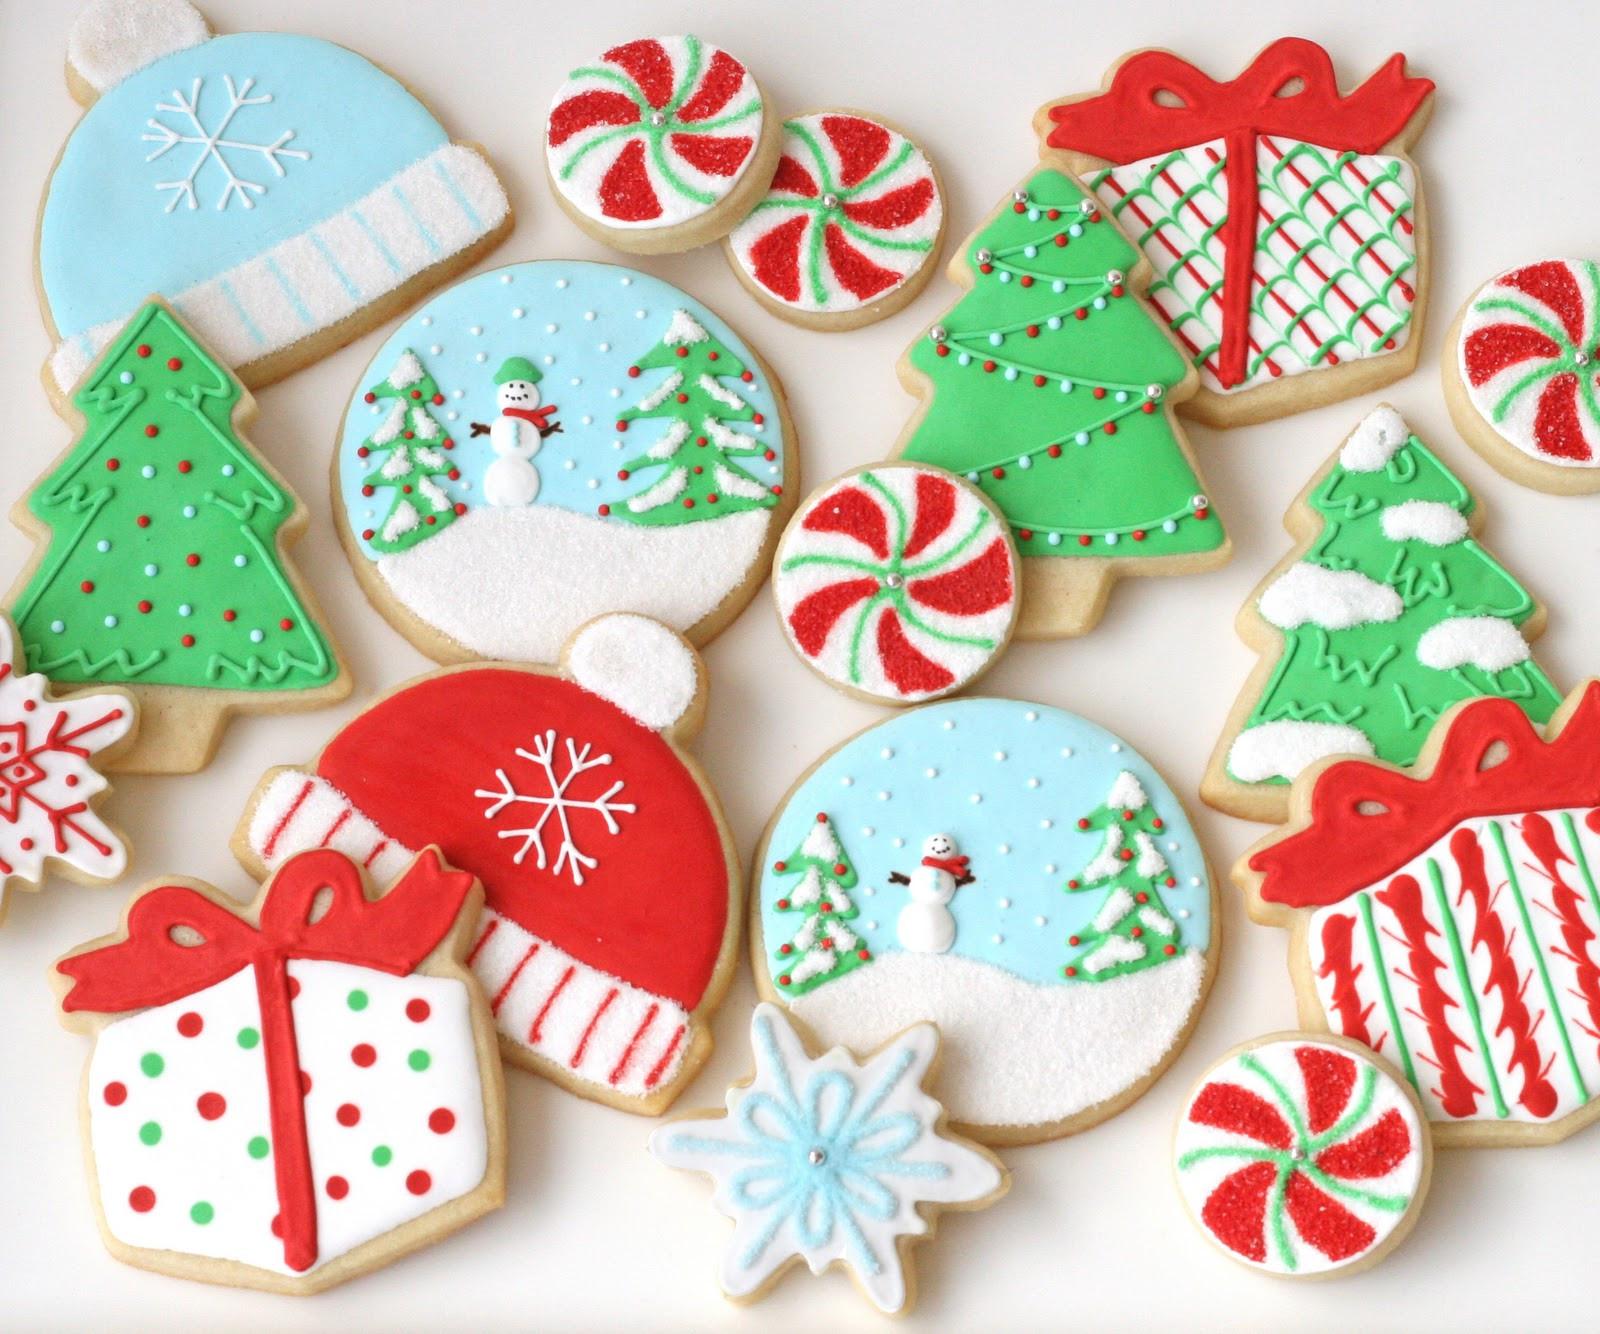 Christmas Sugar Cookie Icing Recipes  Christmas Cookies Galore Glorious Treats